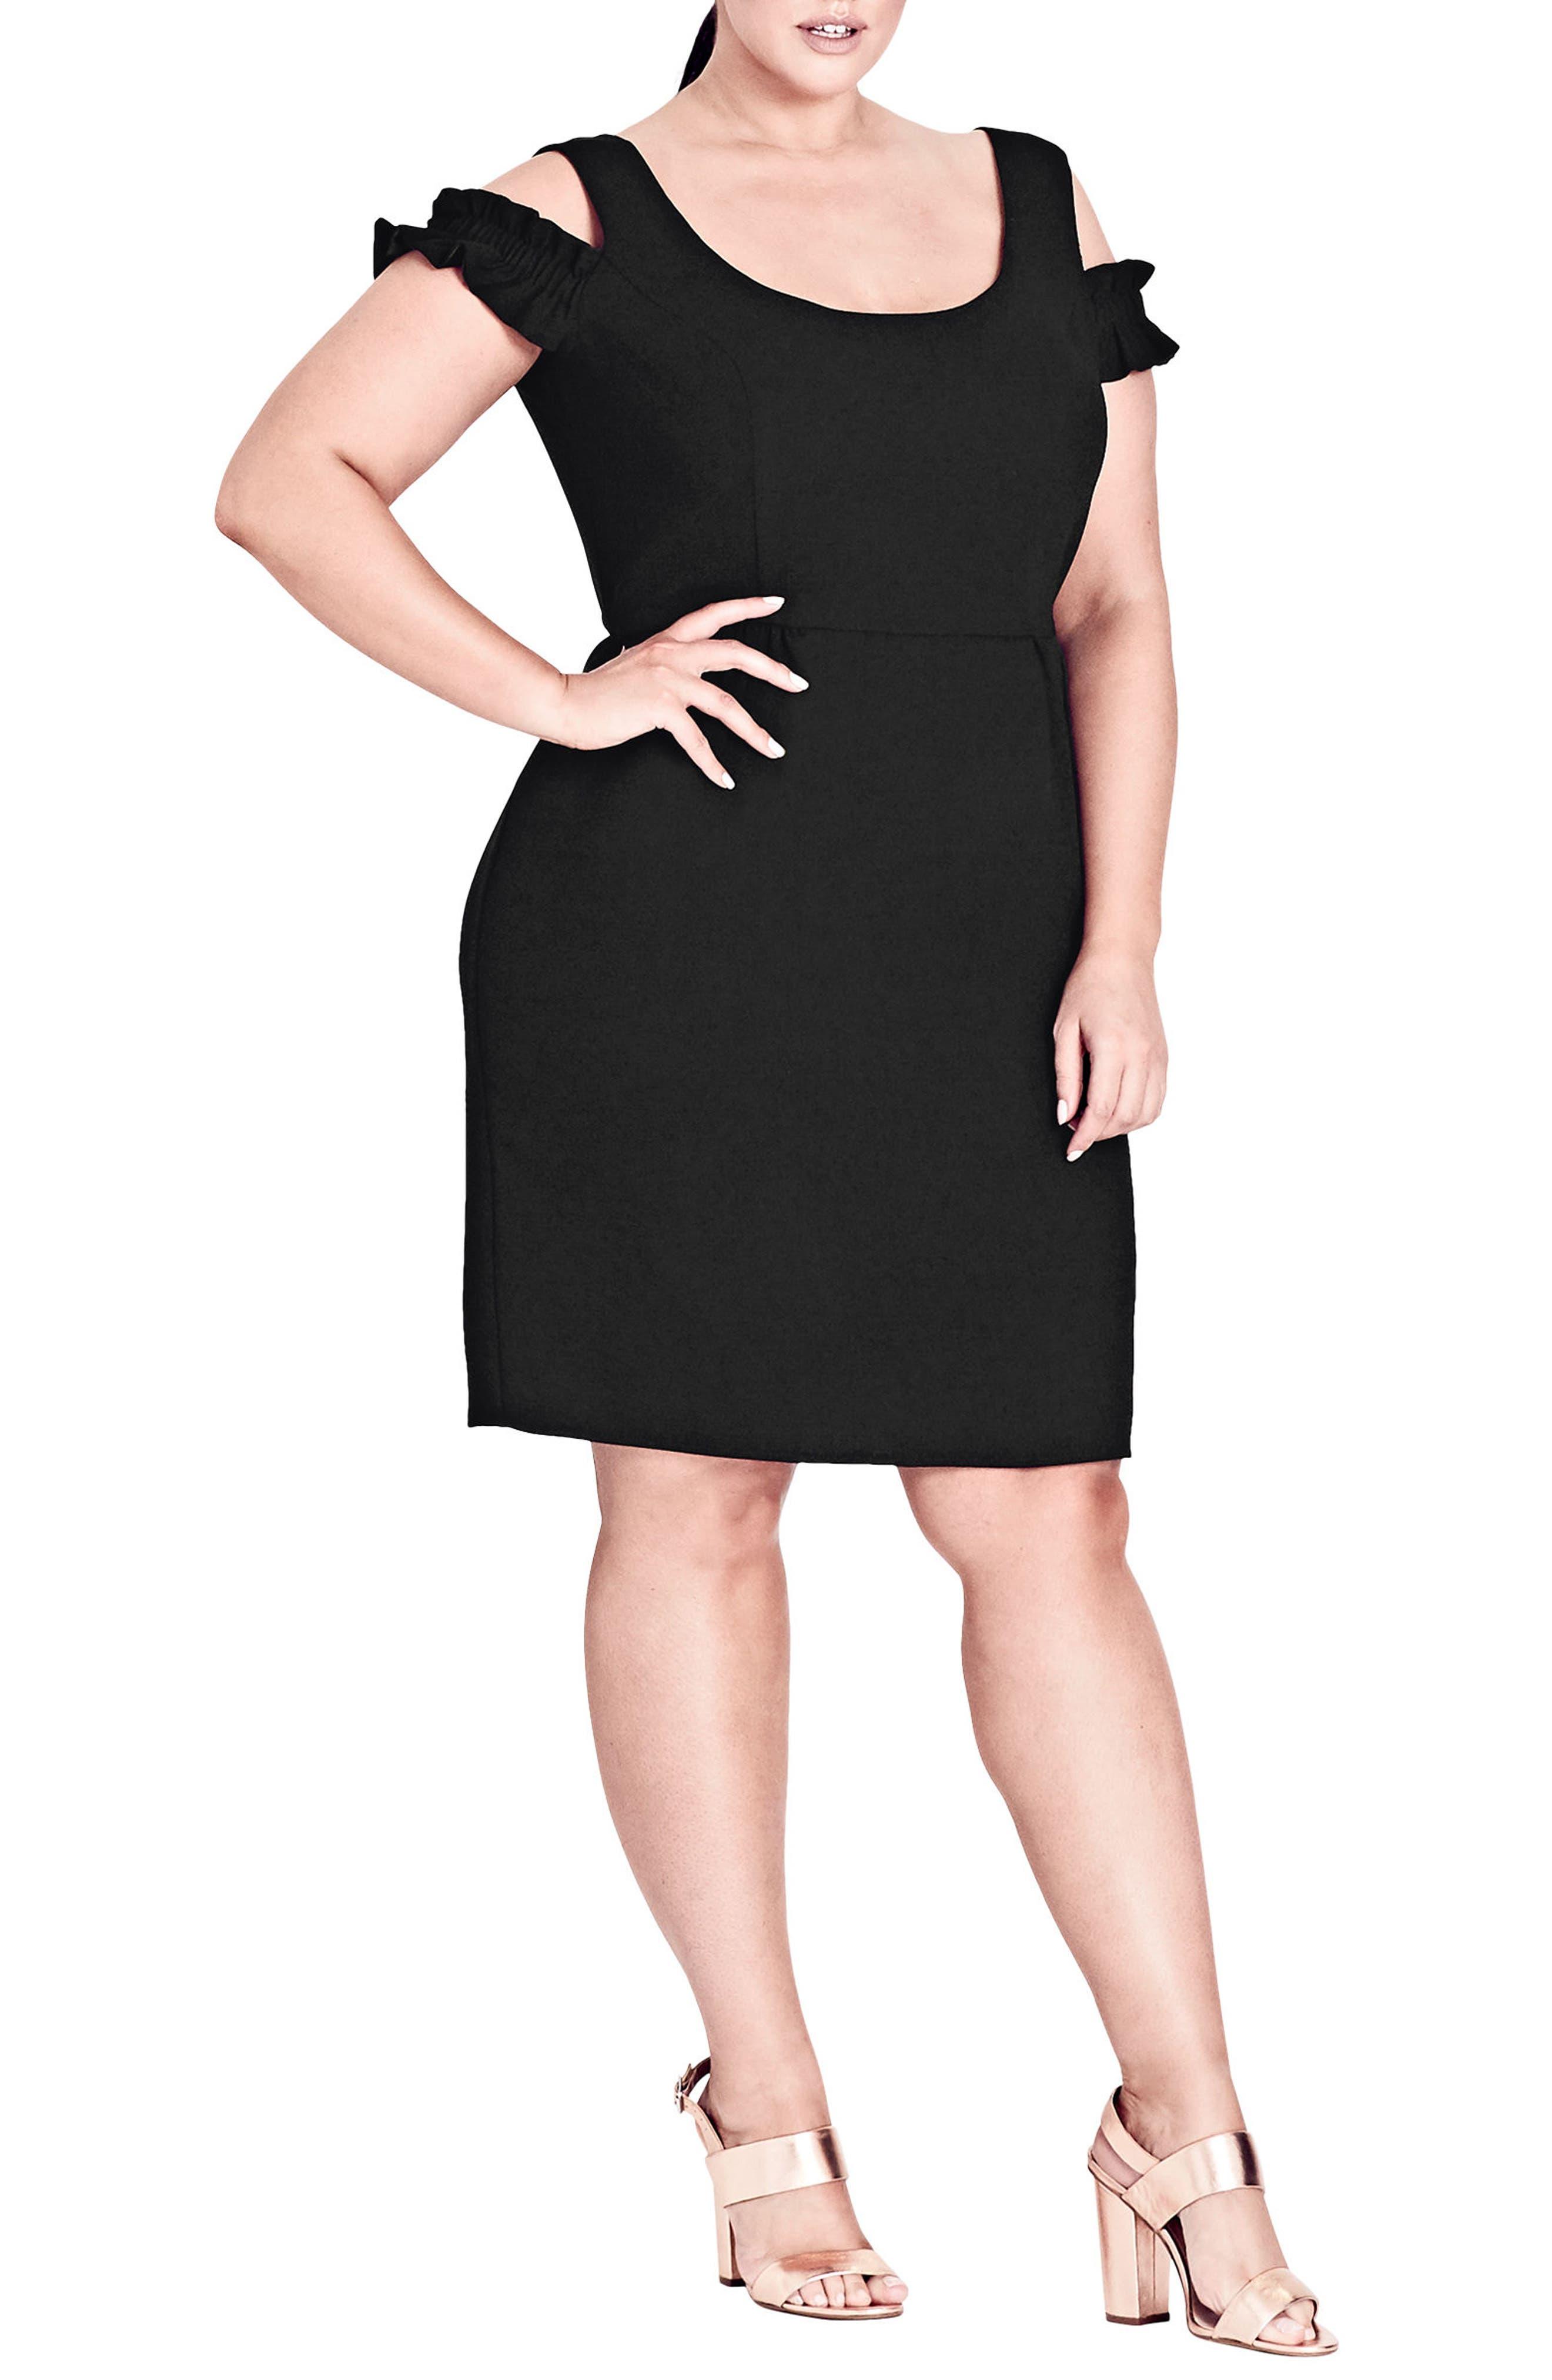 Plus Size City Chic Cute Frill Sheath Dress, Black